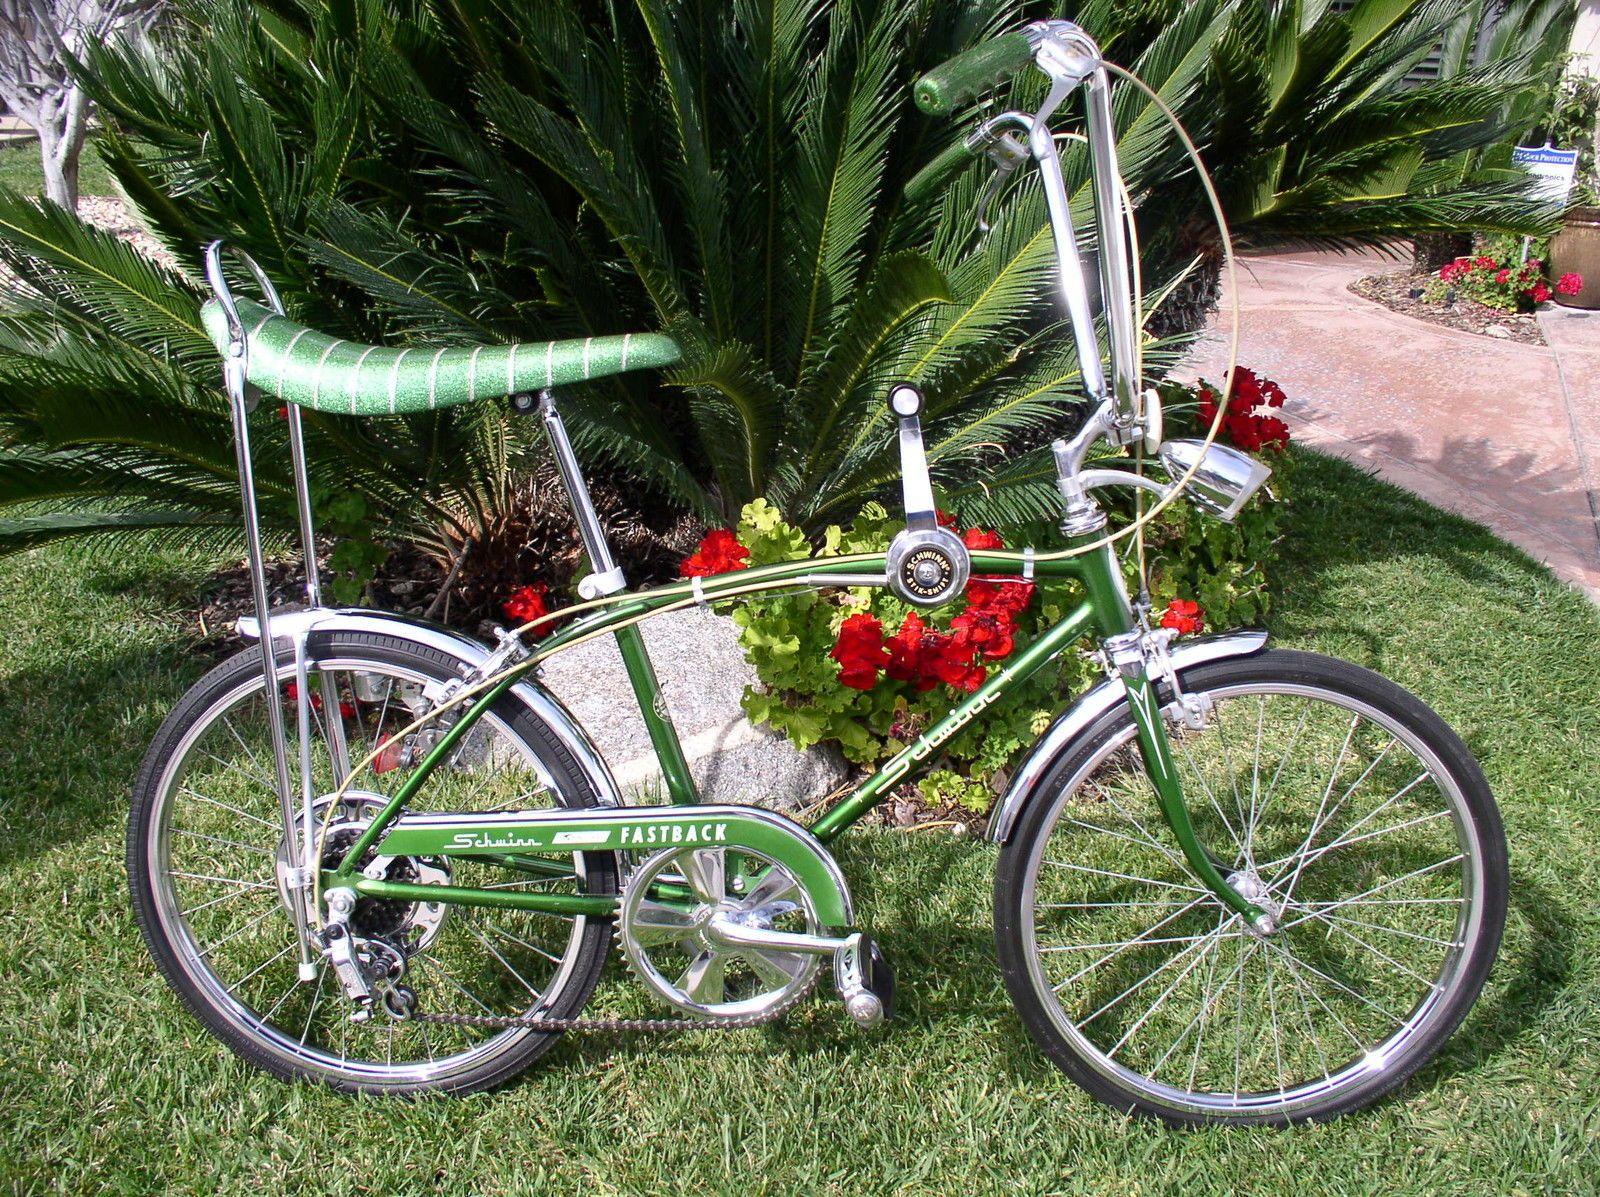 986c3f959d7 Schwinn 1969 Minty 5 Speed Stik Fastback Nice All Original Vintage Bicycle  Bike | eBay